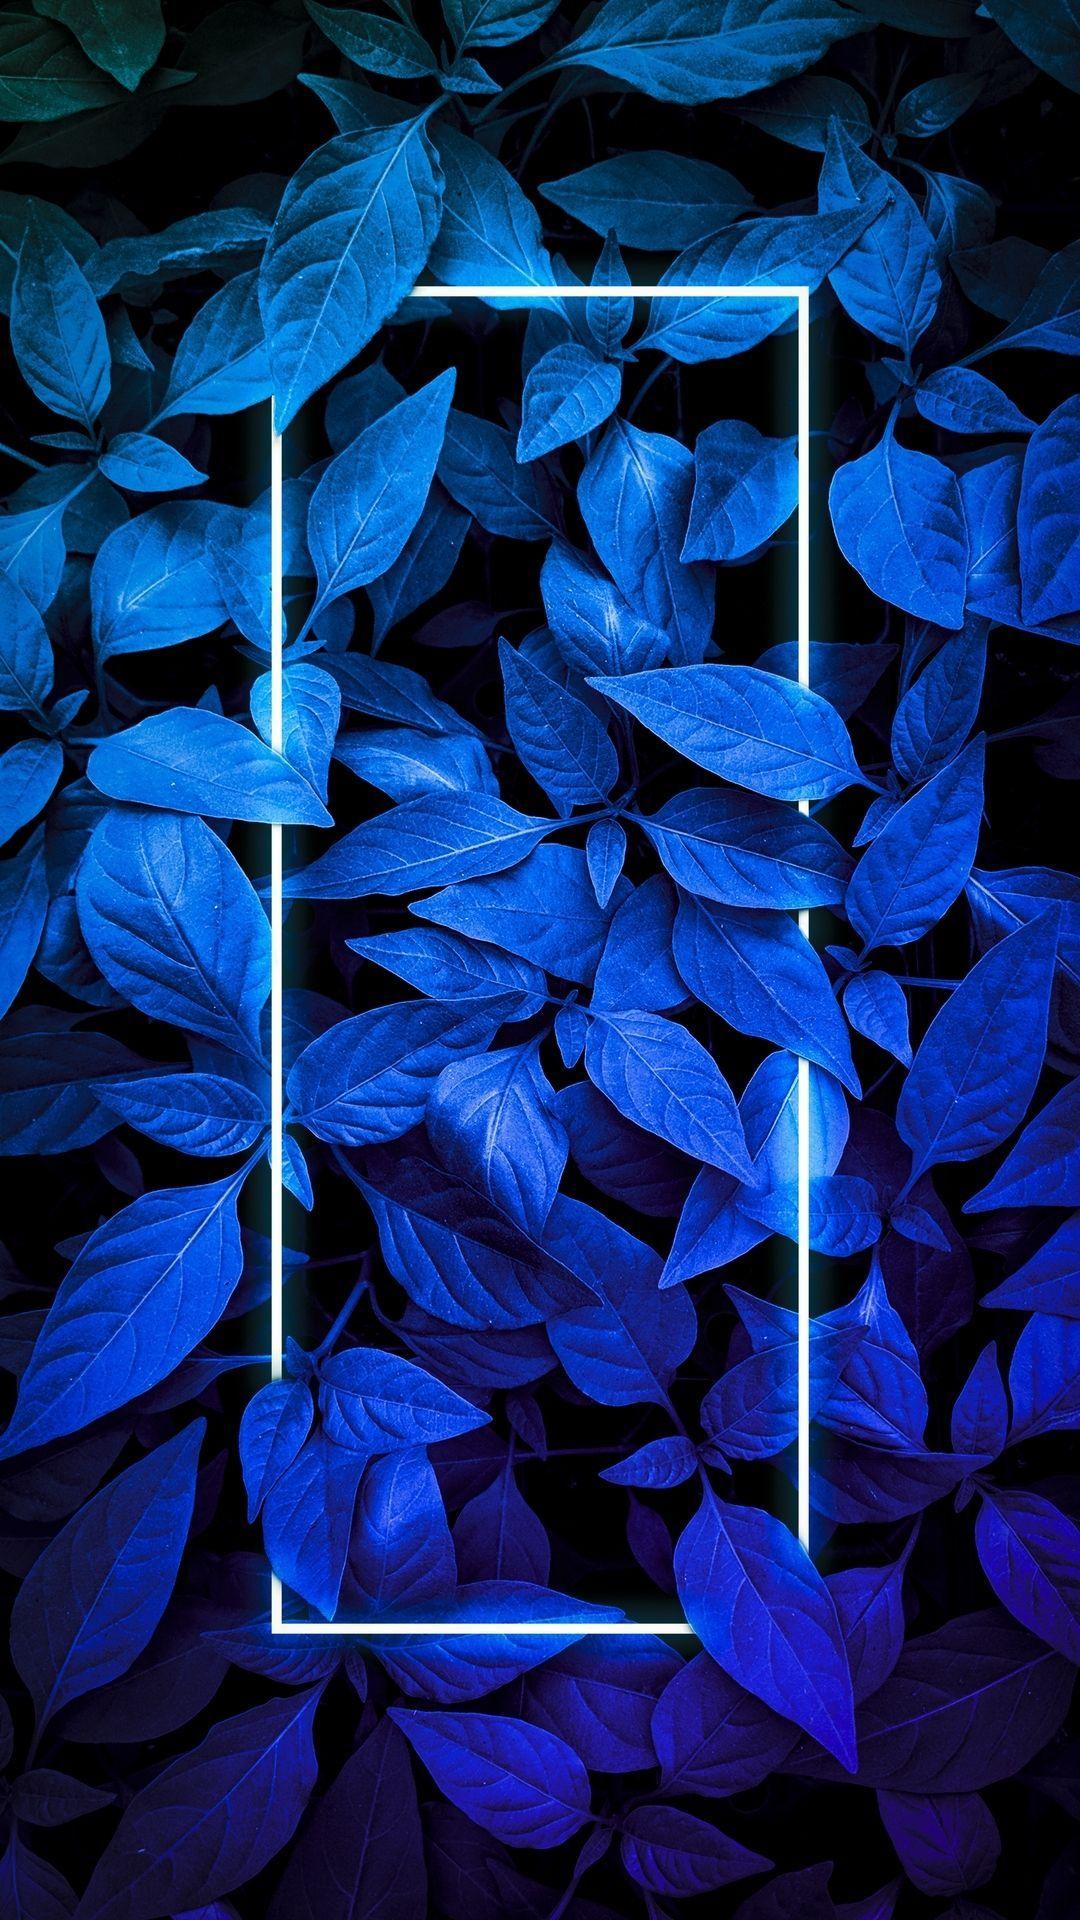 Apple Iphone Wallpaper Iphone Wallpaper Photos Blue Wallpaper Iphone Neon Light Wallpaper